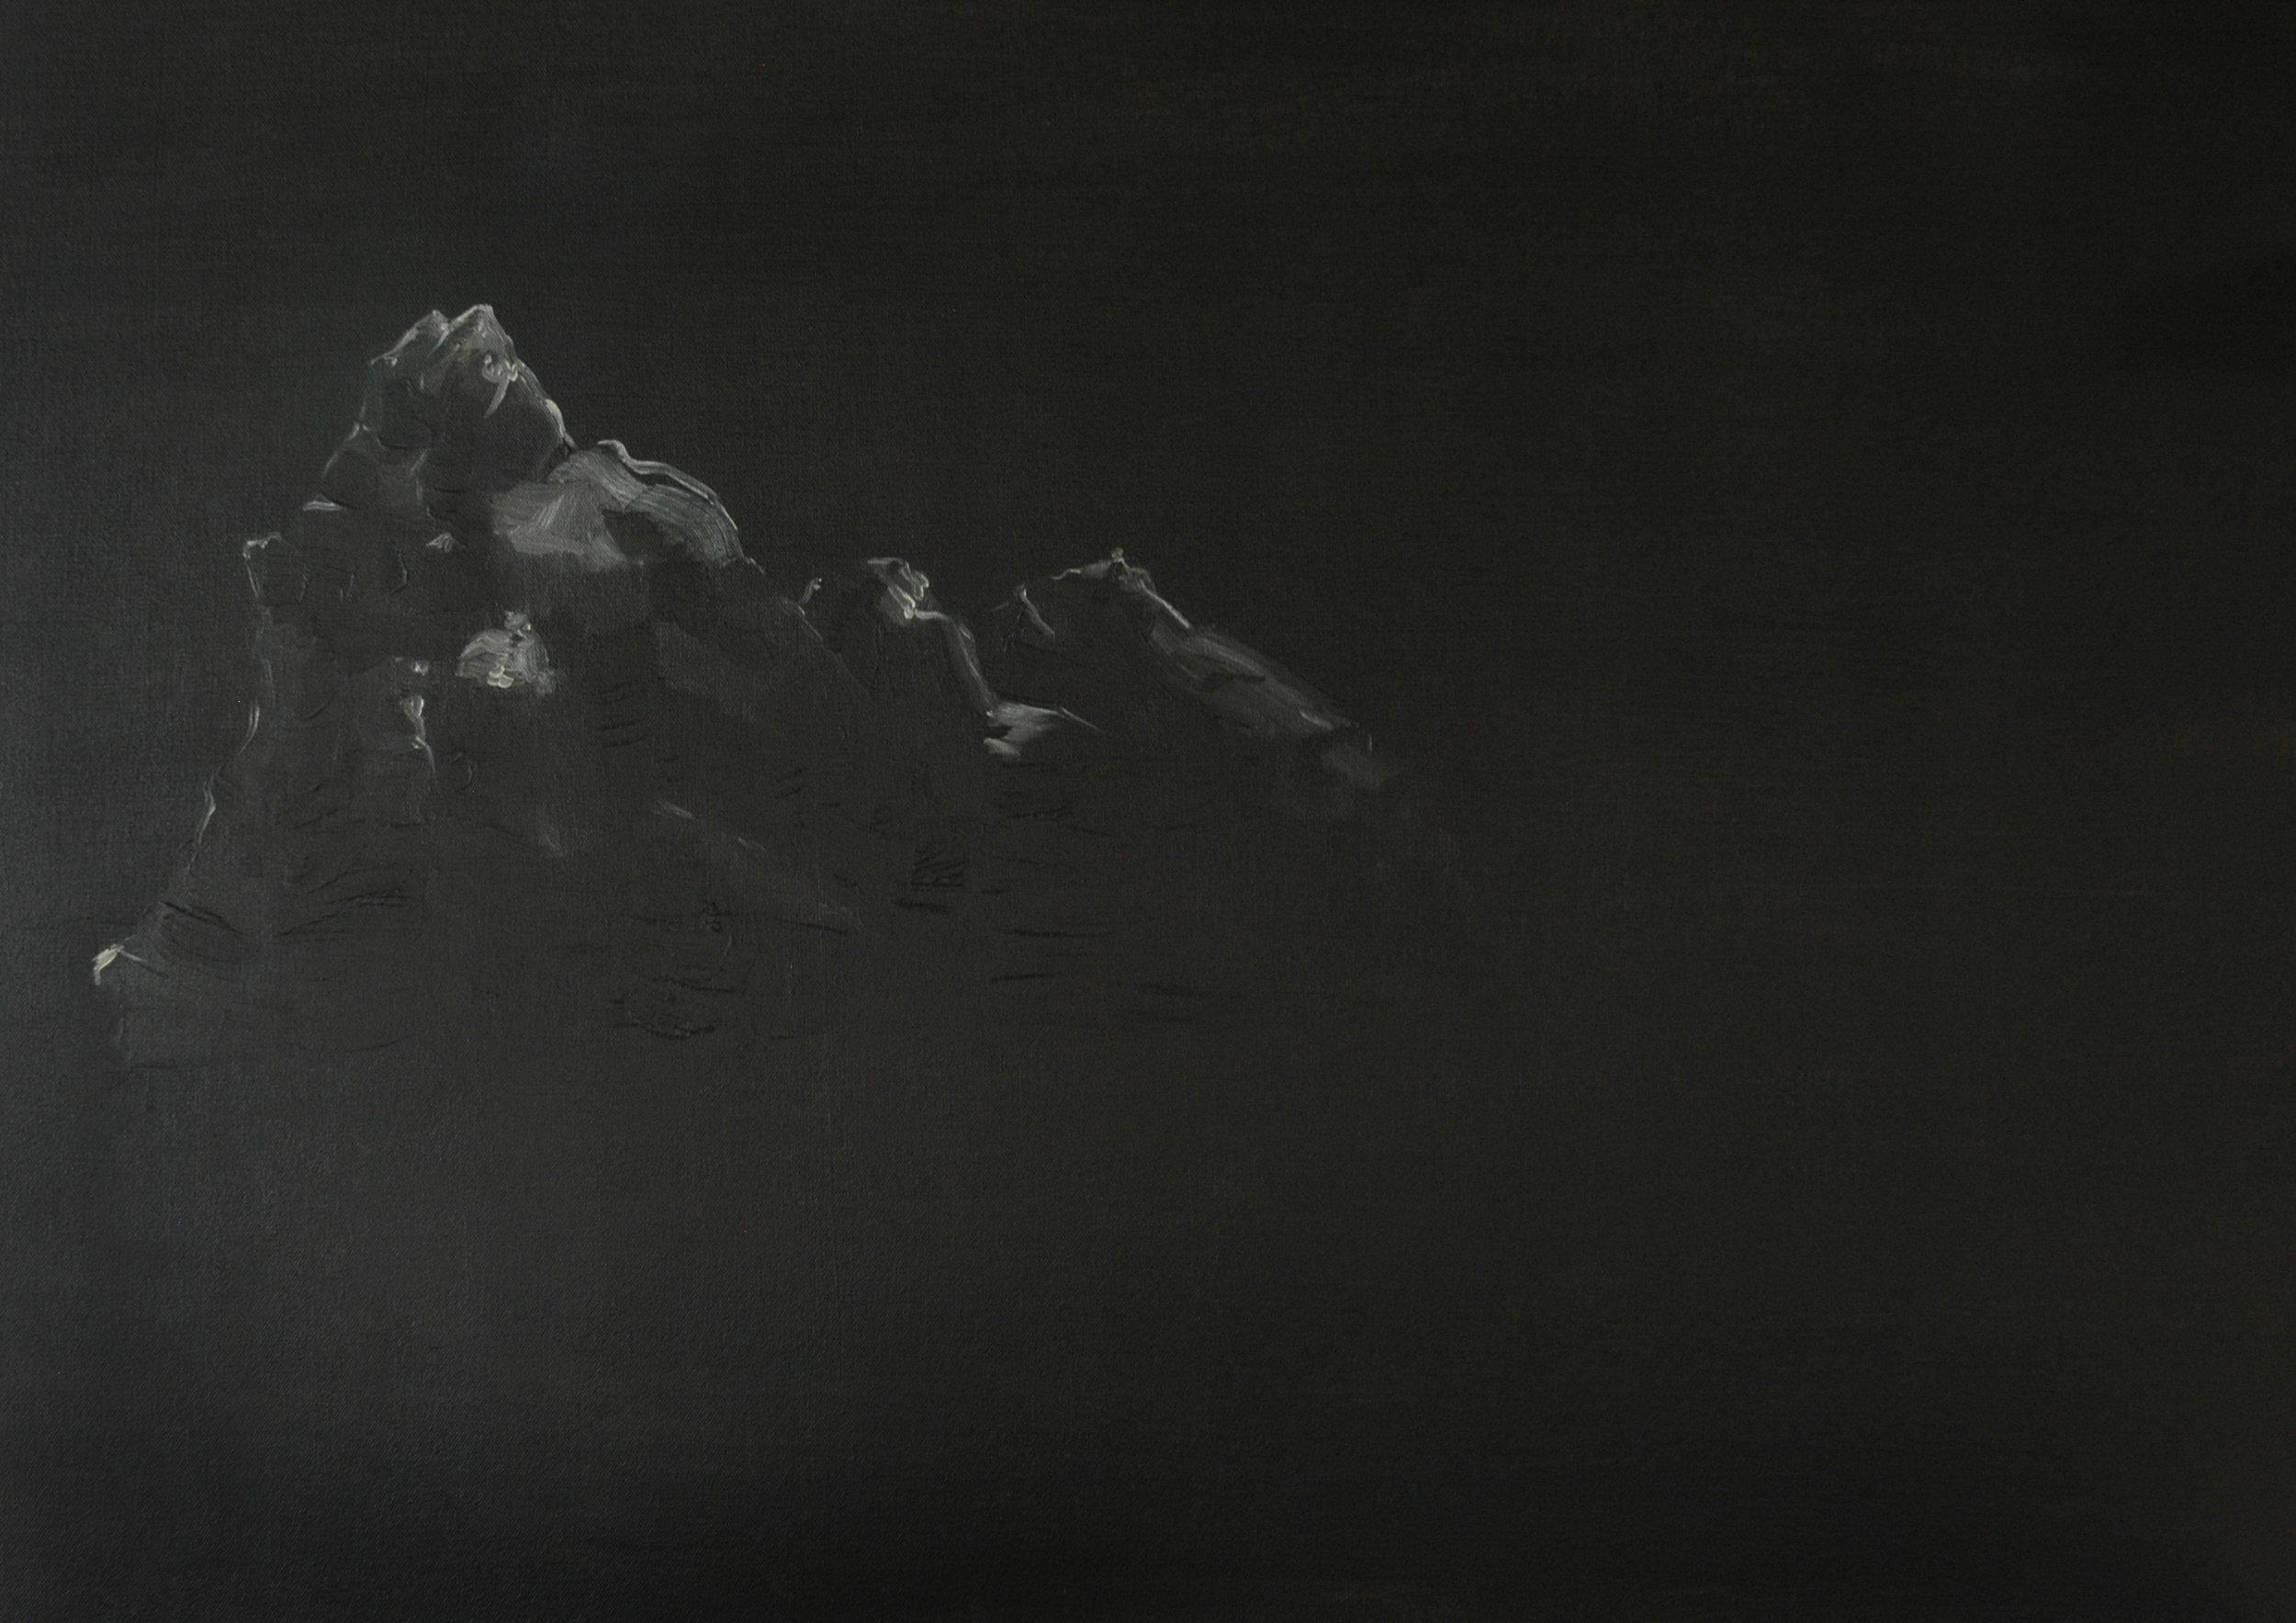 Damien Flood, Summit, 2009, Oil on canvas, 71 x 91 cm